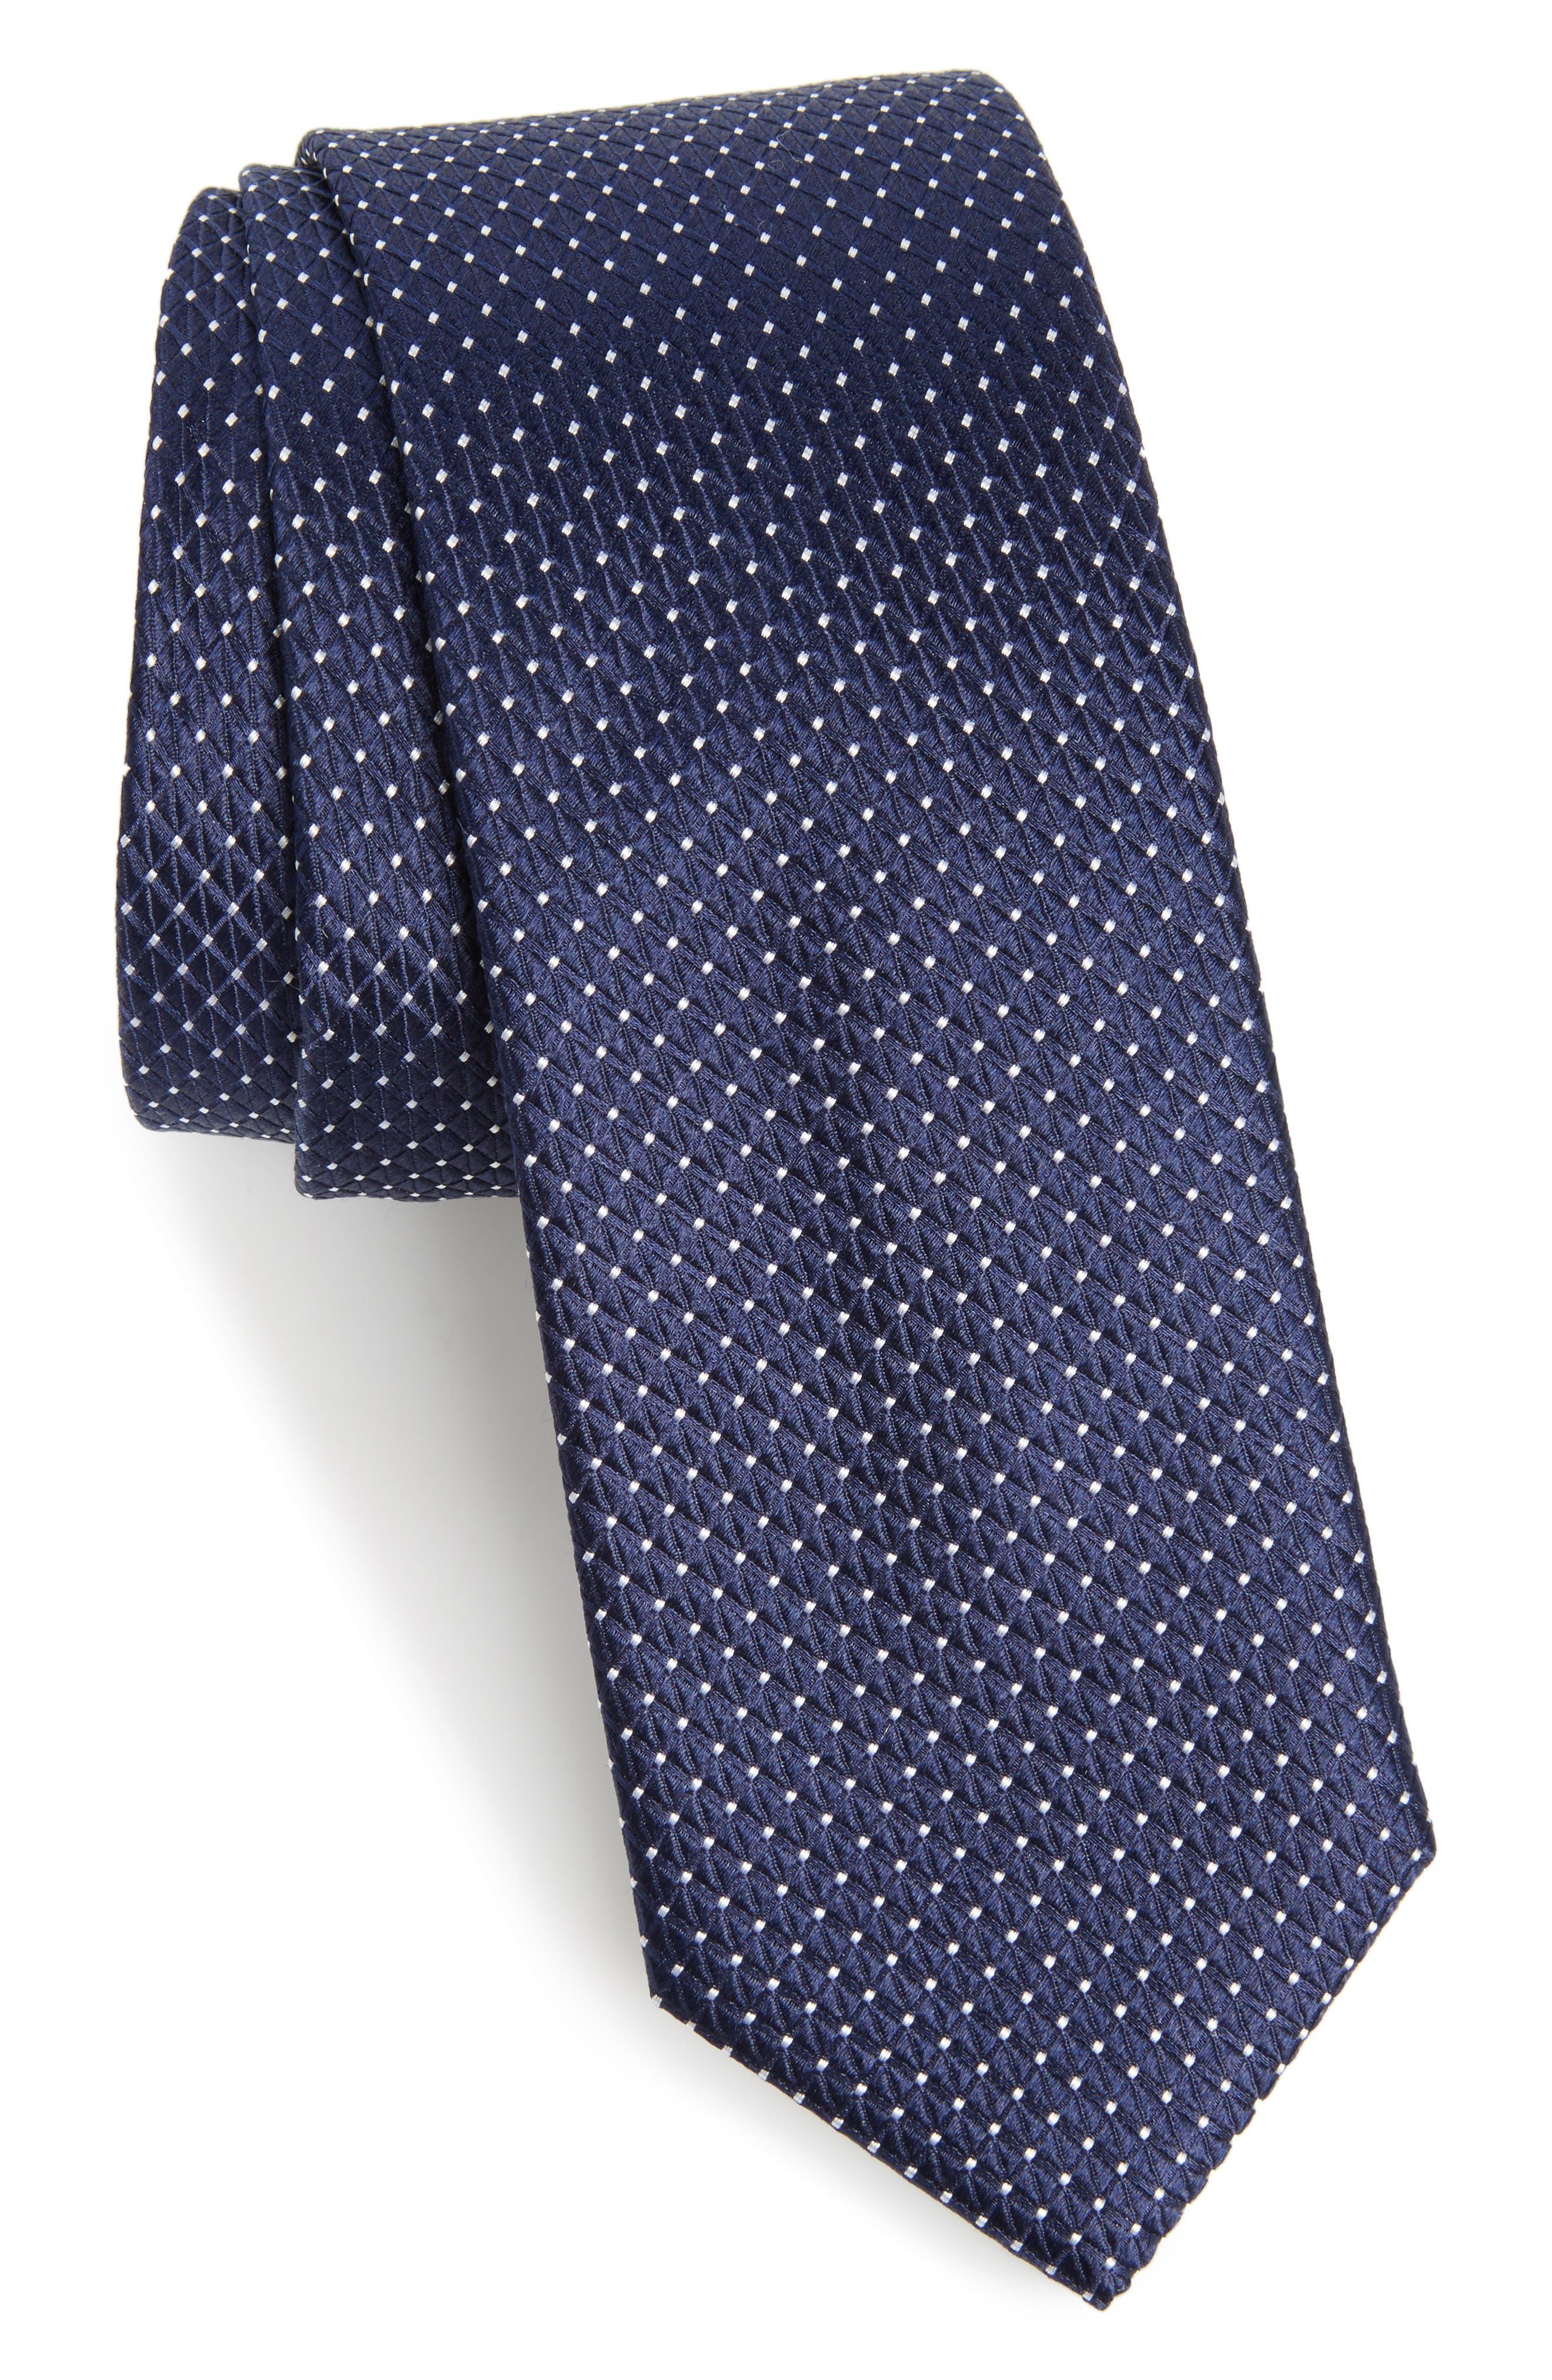 Alternate Image 1 Selected - Nordstrom Men's Shop Hammond Neat Silk Tie